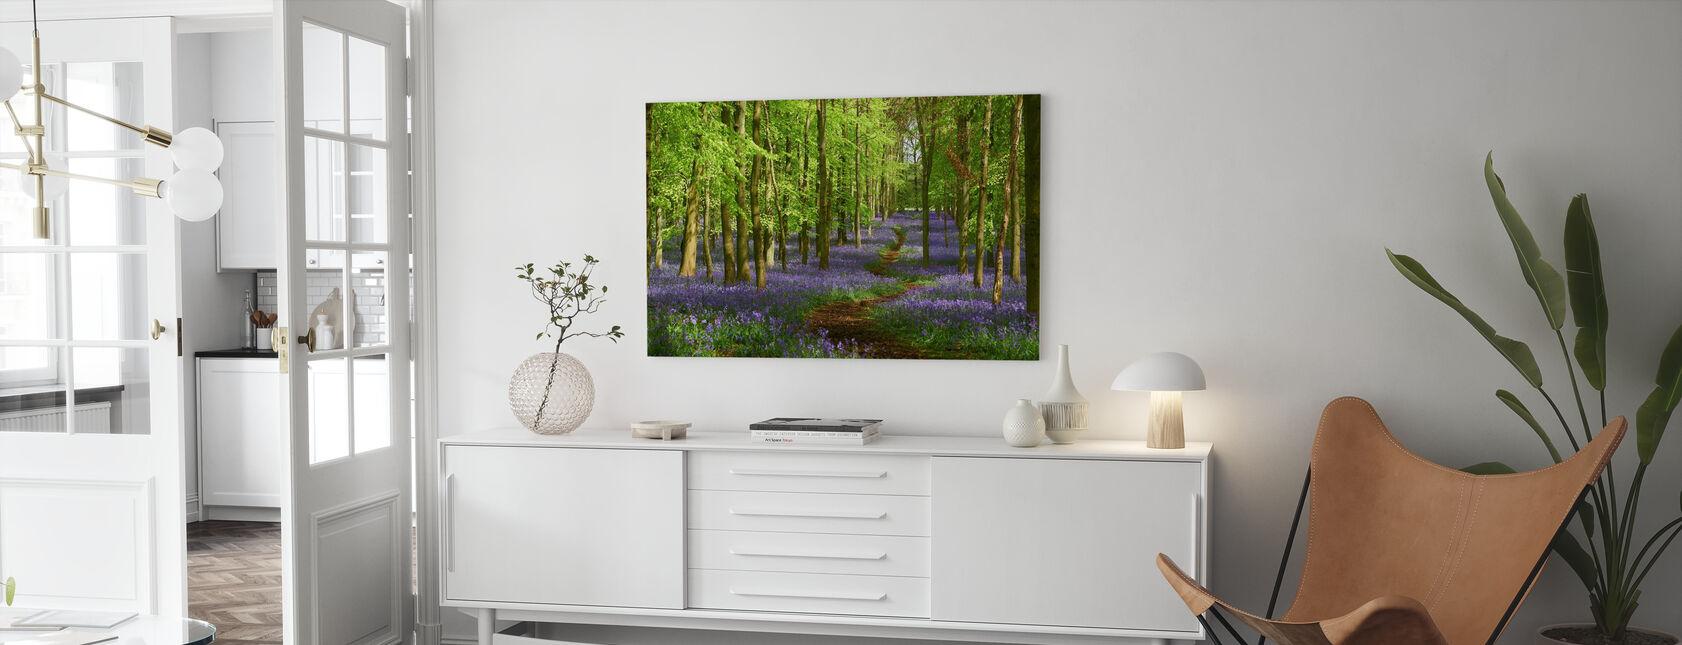 Springtime Bluebell - Leinwandbild - Wohnzimmer